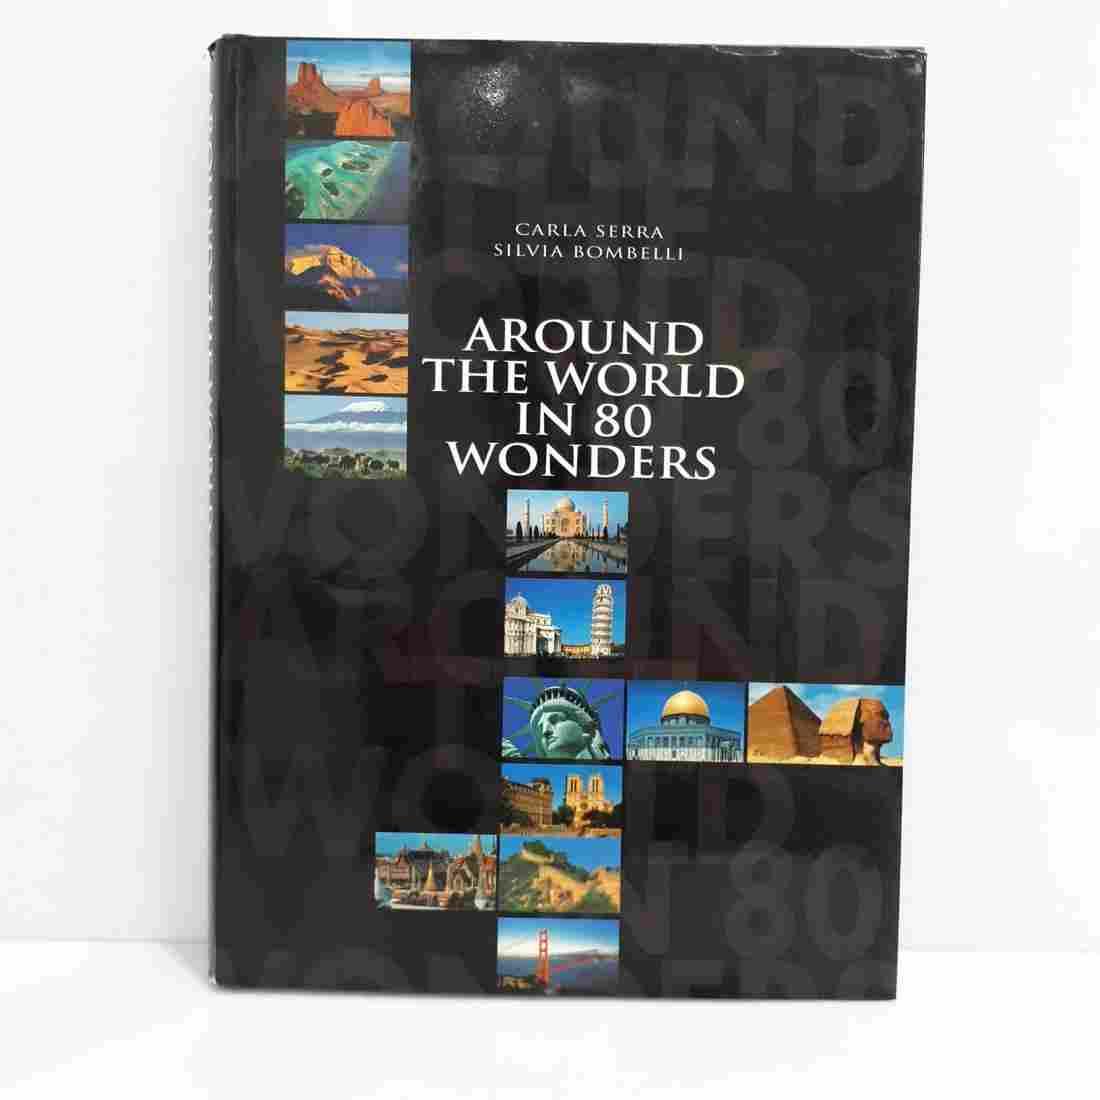 AROUND THE WORLD IN 80 WONDERS